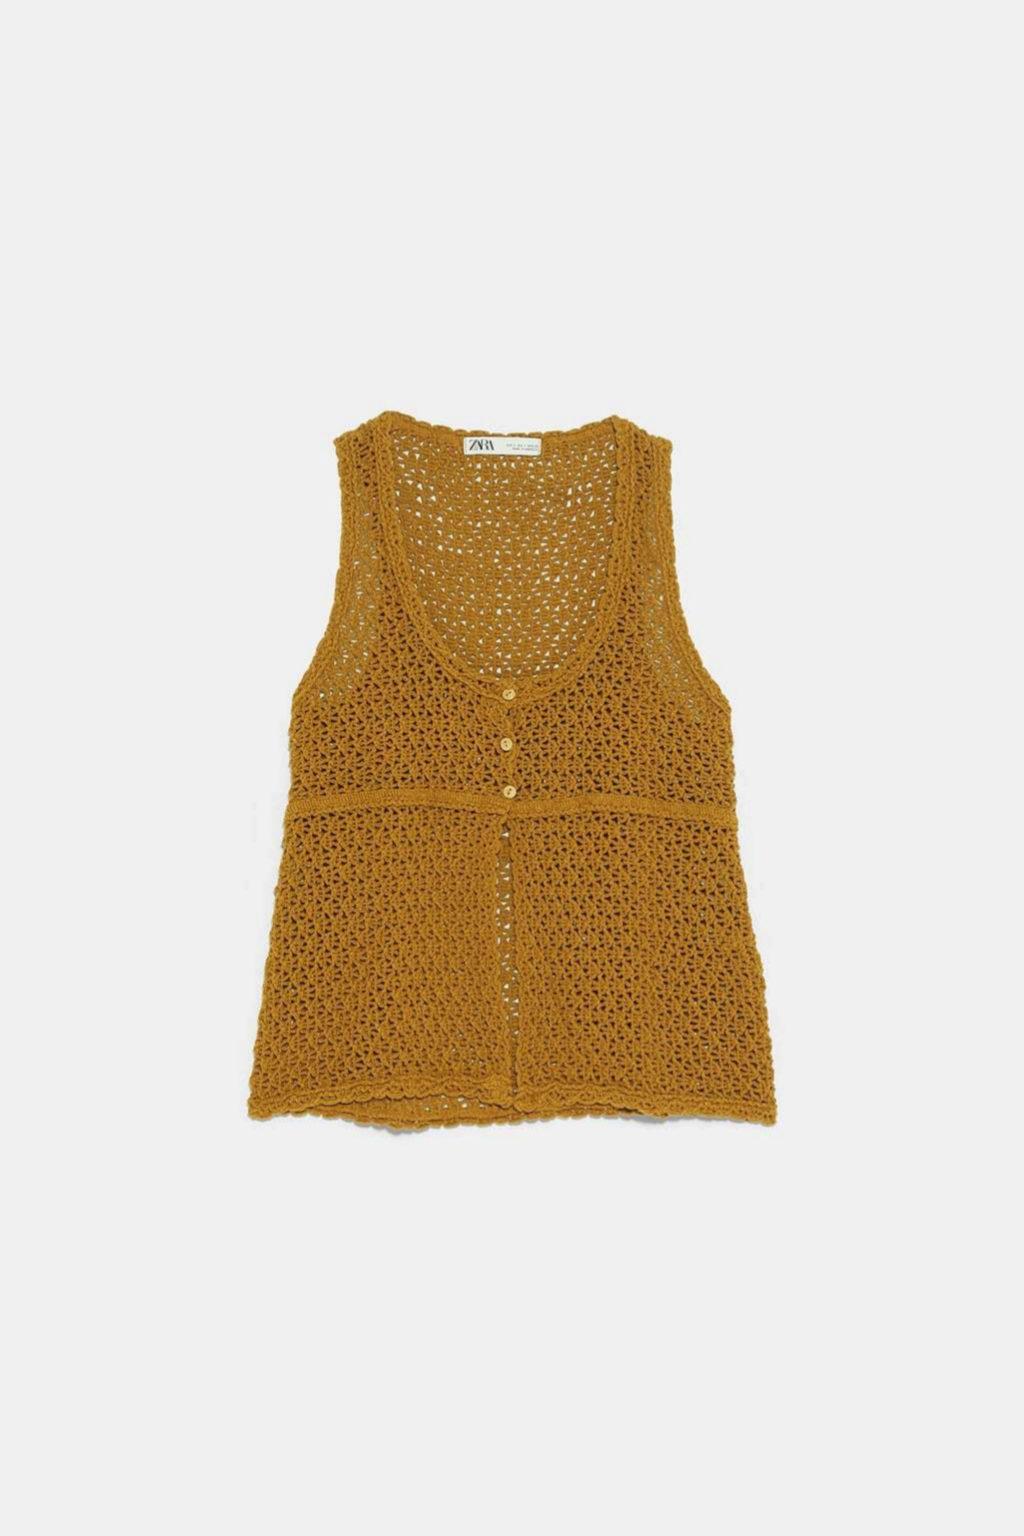 Top de crochet en color oliva de Zara